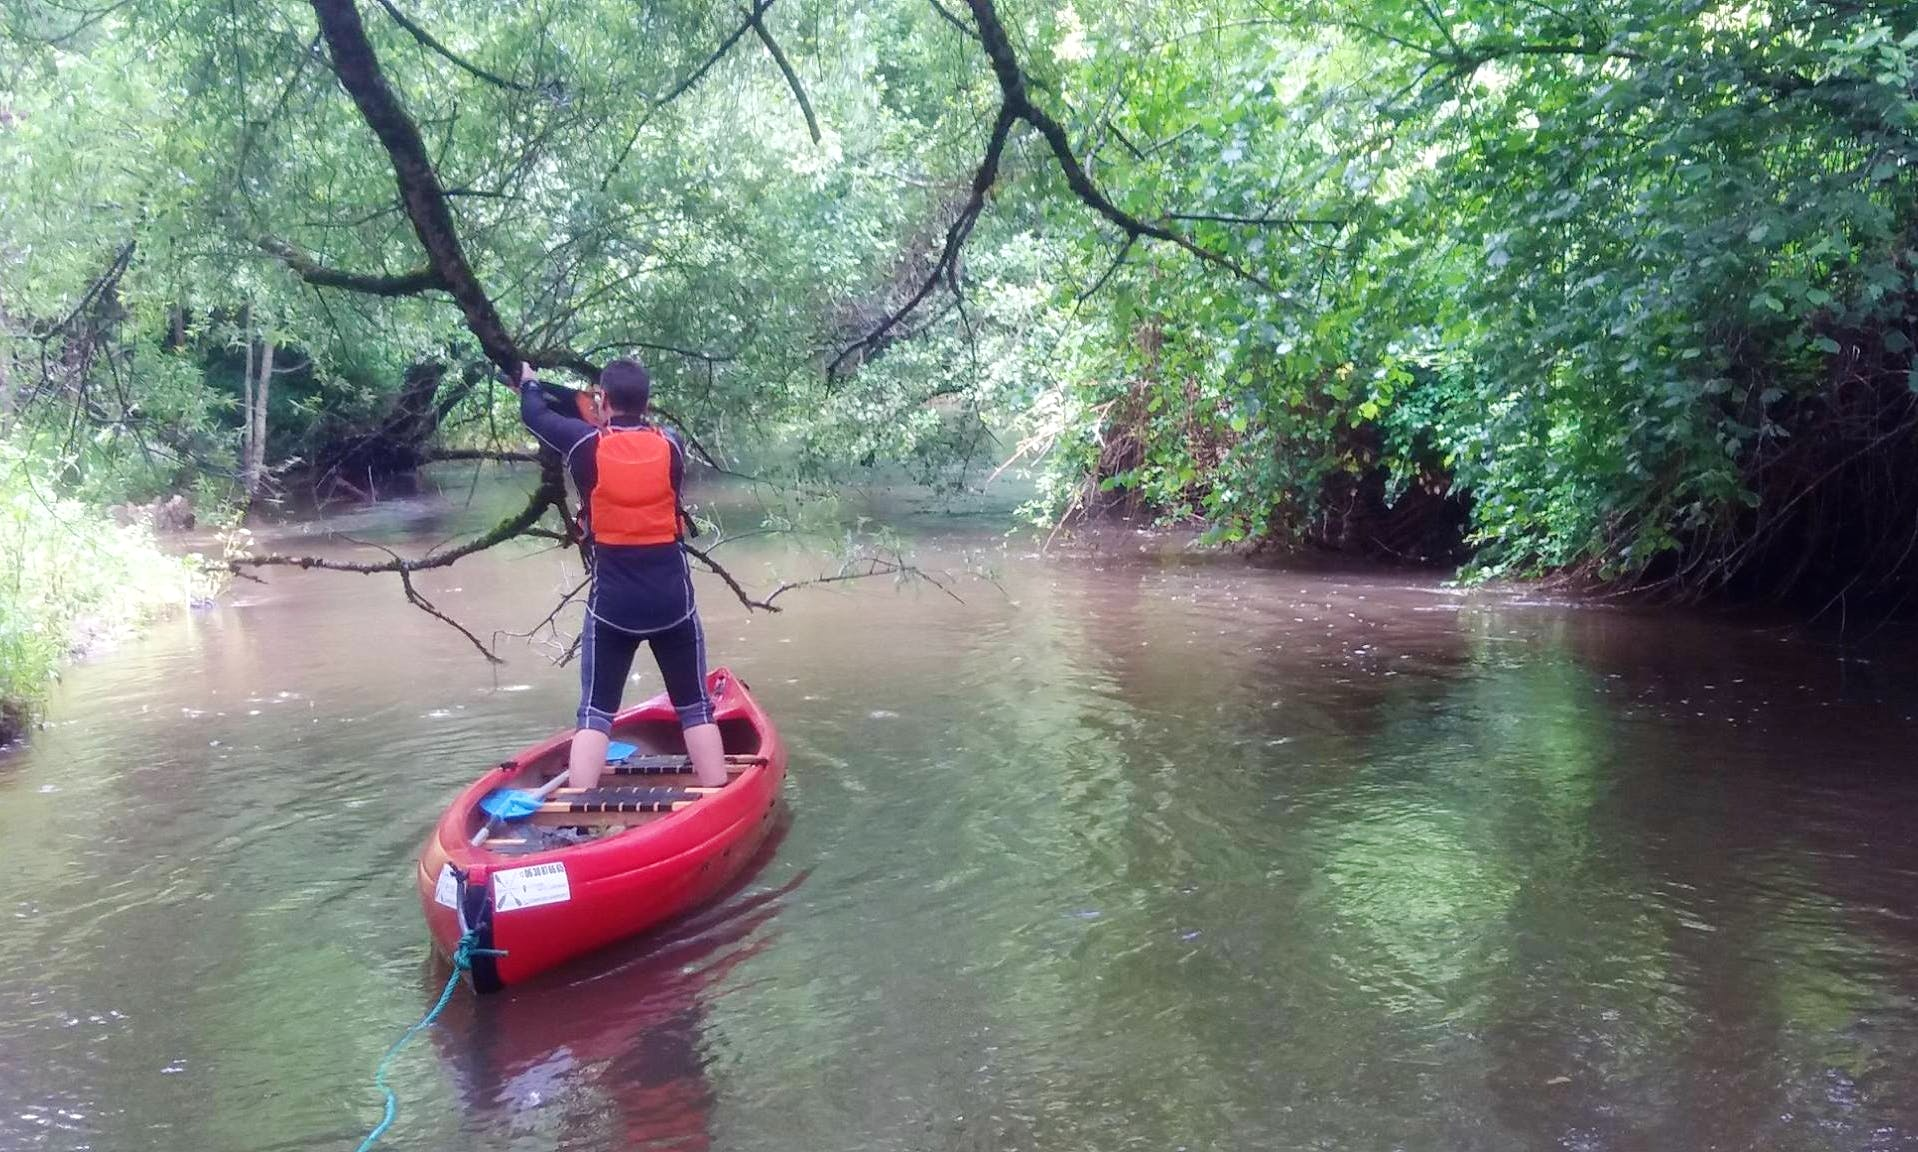 Enjoy Canoeing in Carennac, Occitanie